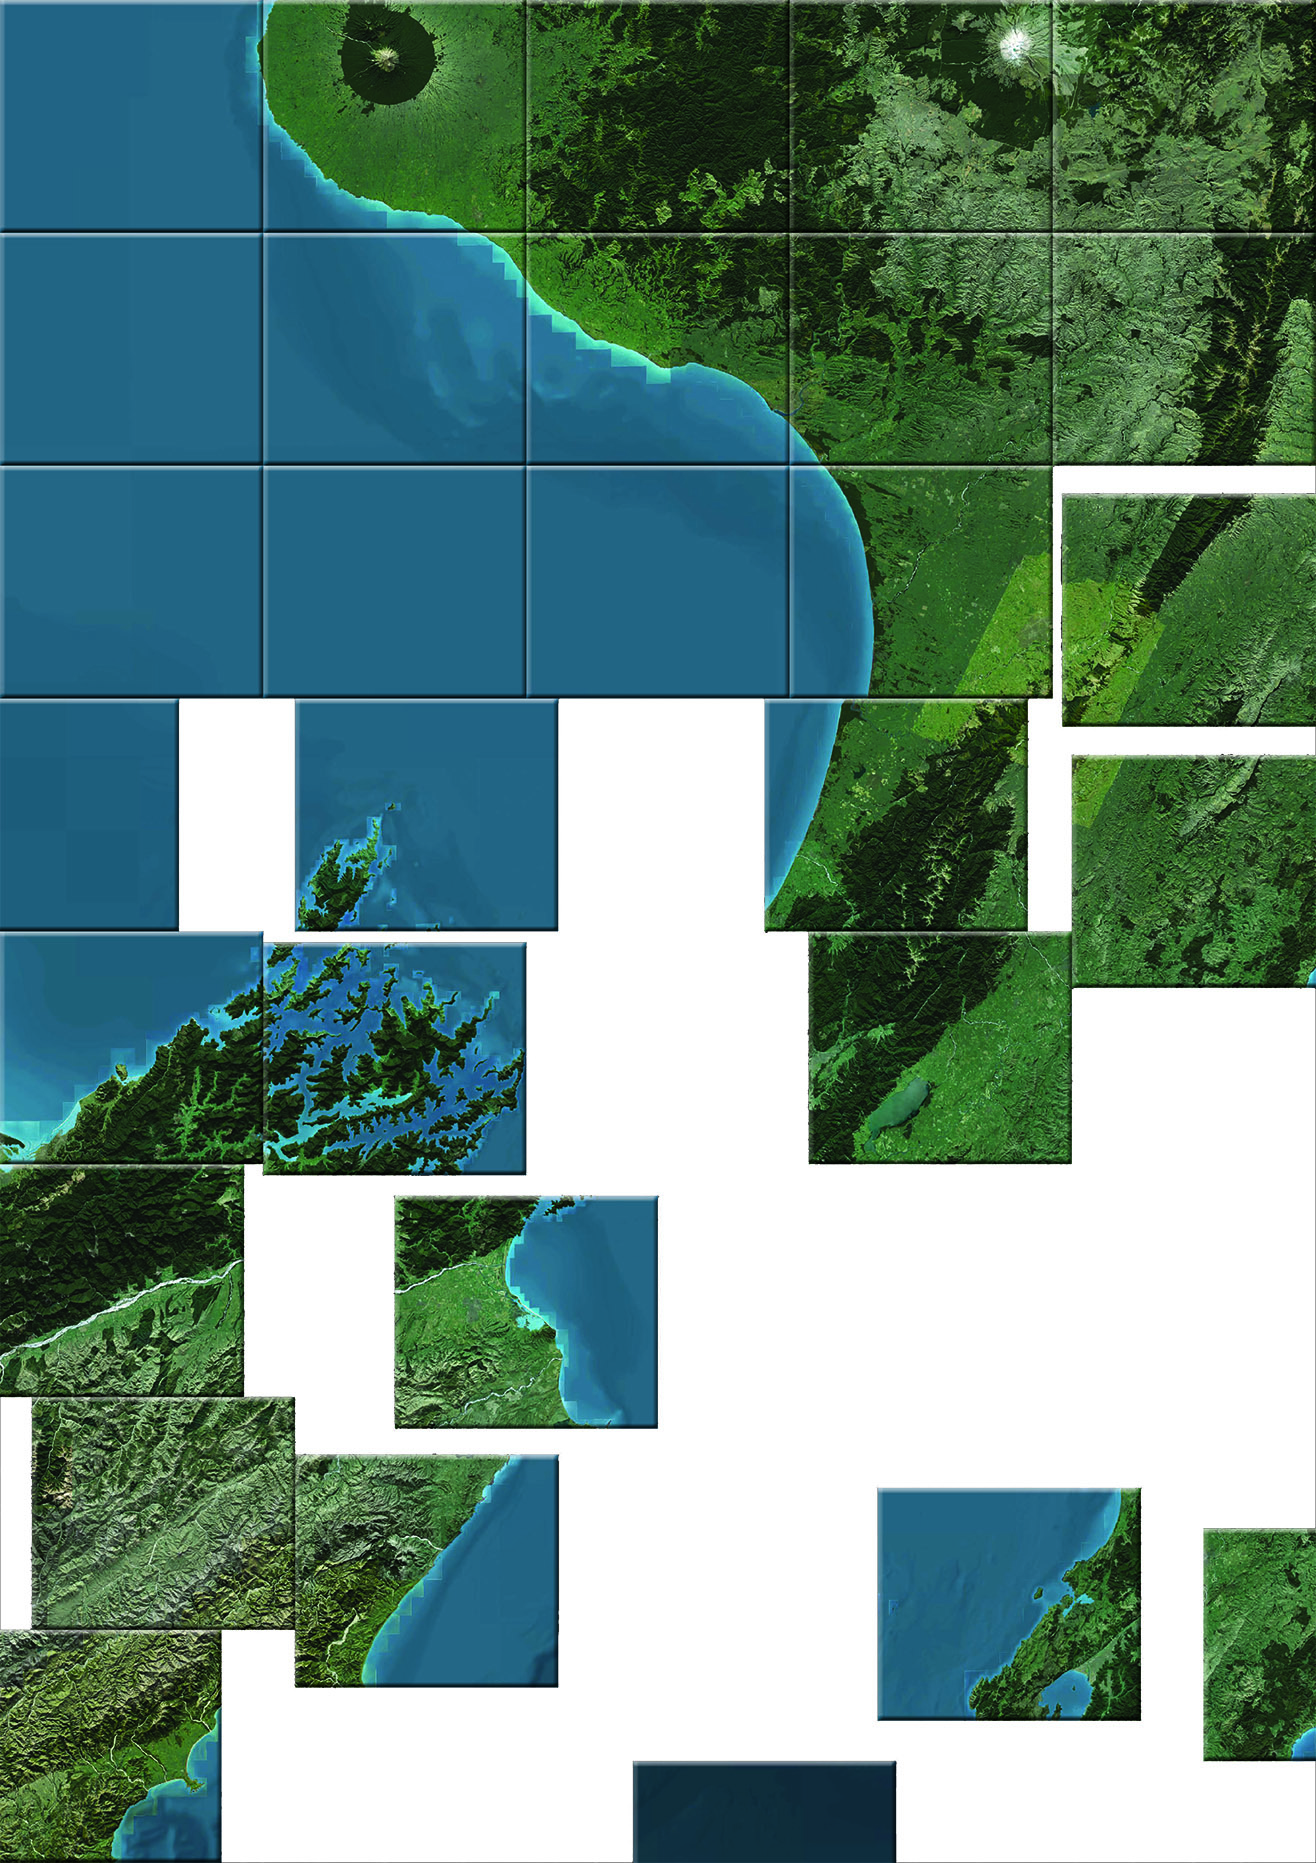 nz_puzzle